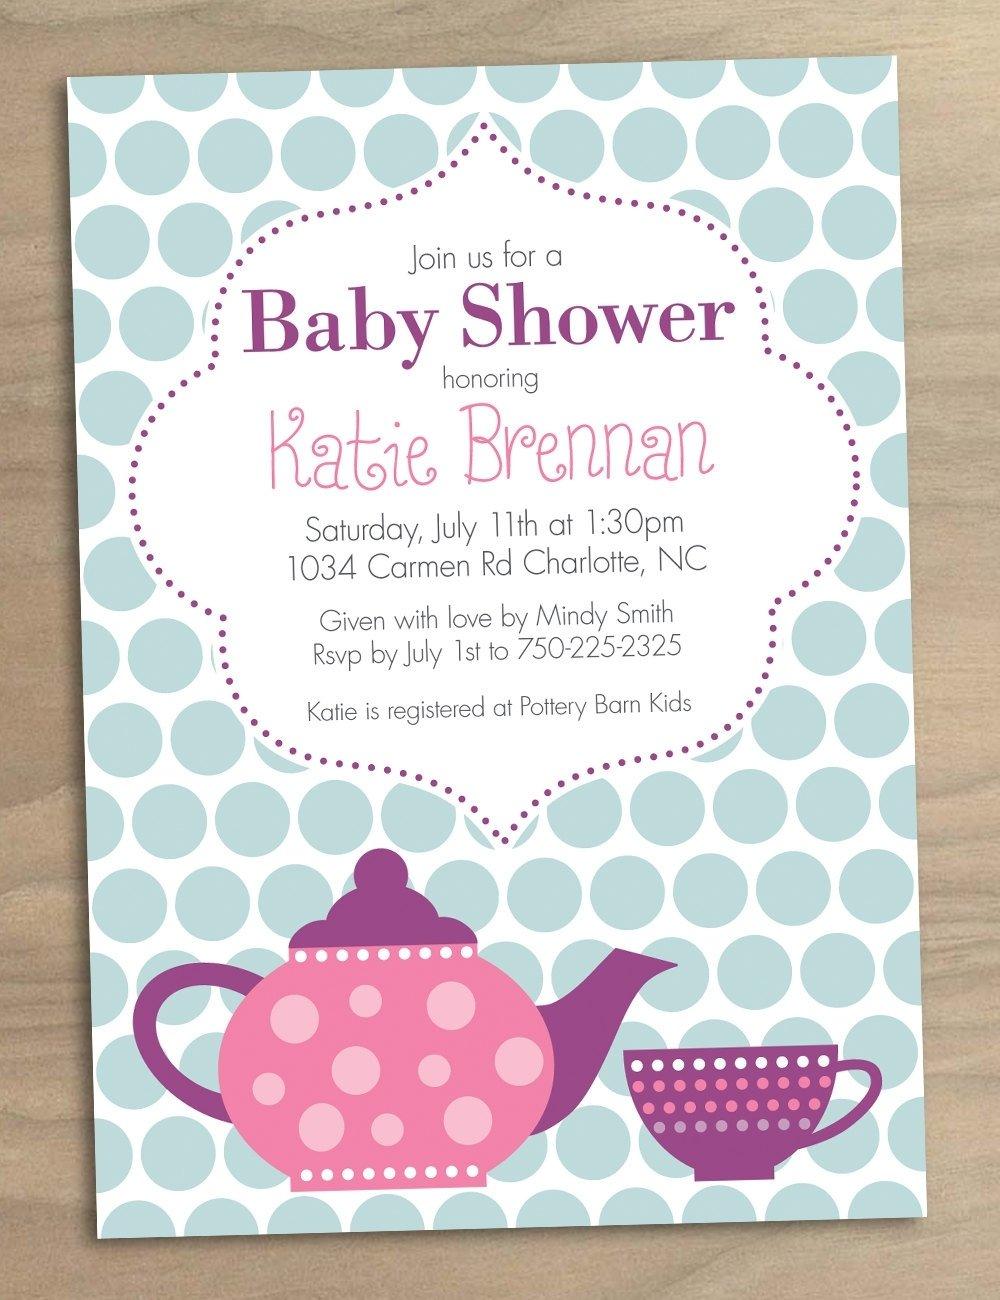 10 Fashionable Ideas For Baby Shower Invitations high tea baby shower invites templates sempak e39380a5e502 1 2021